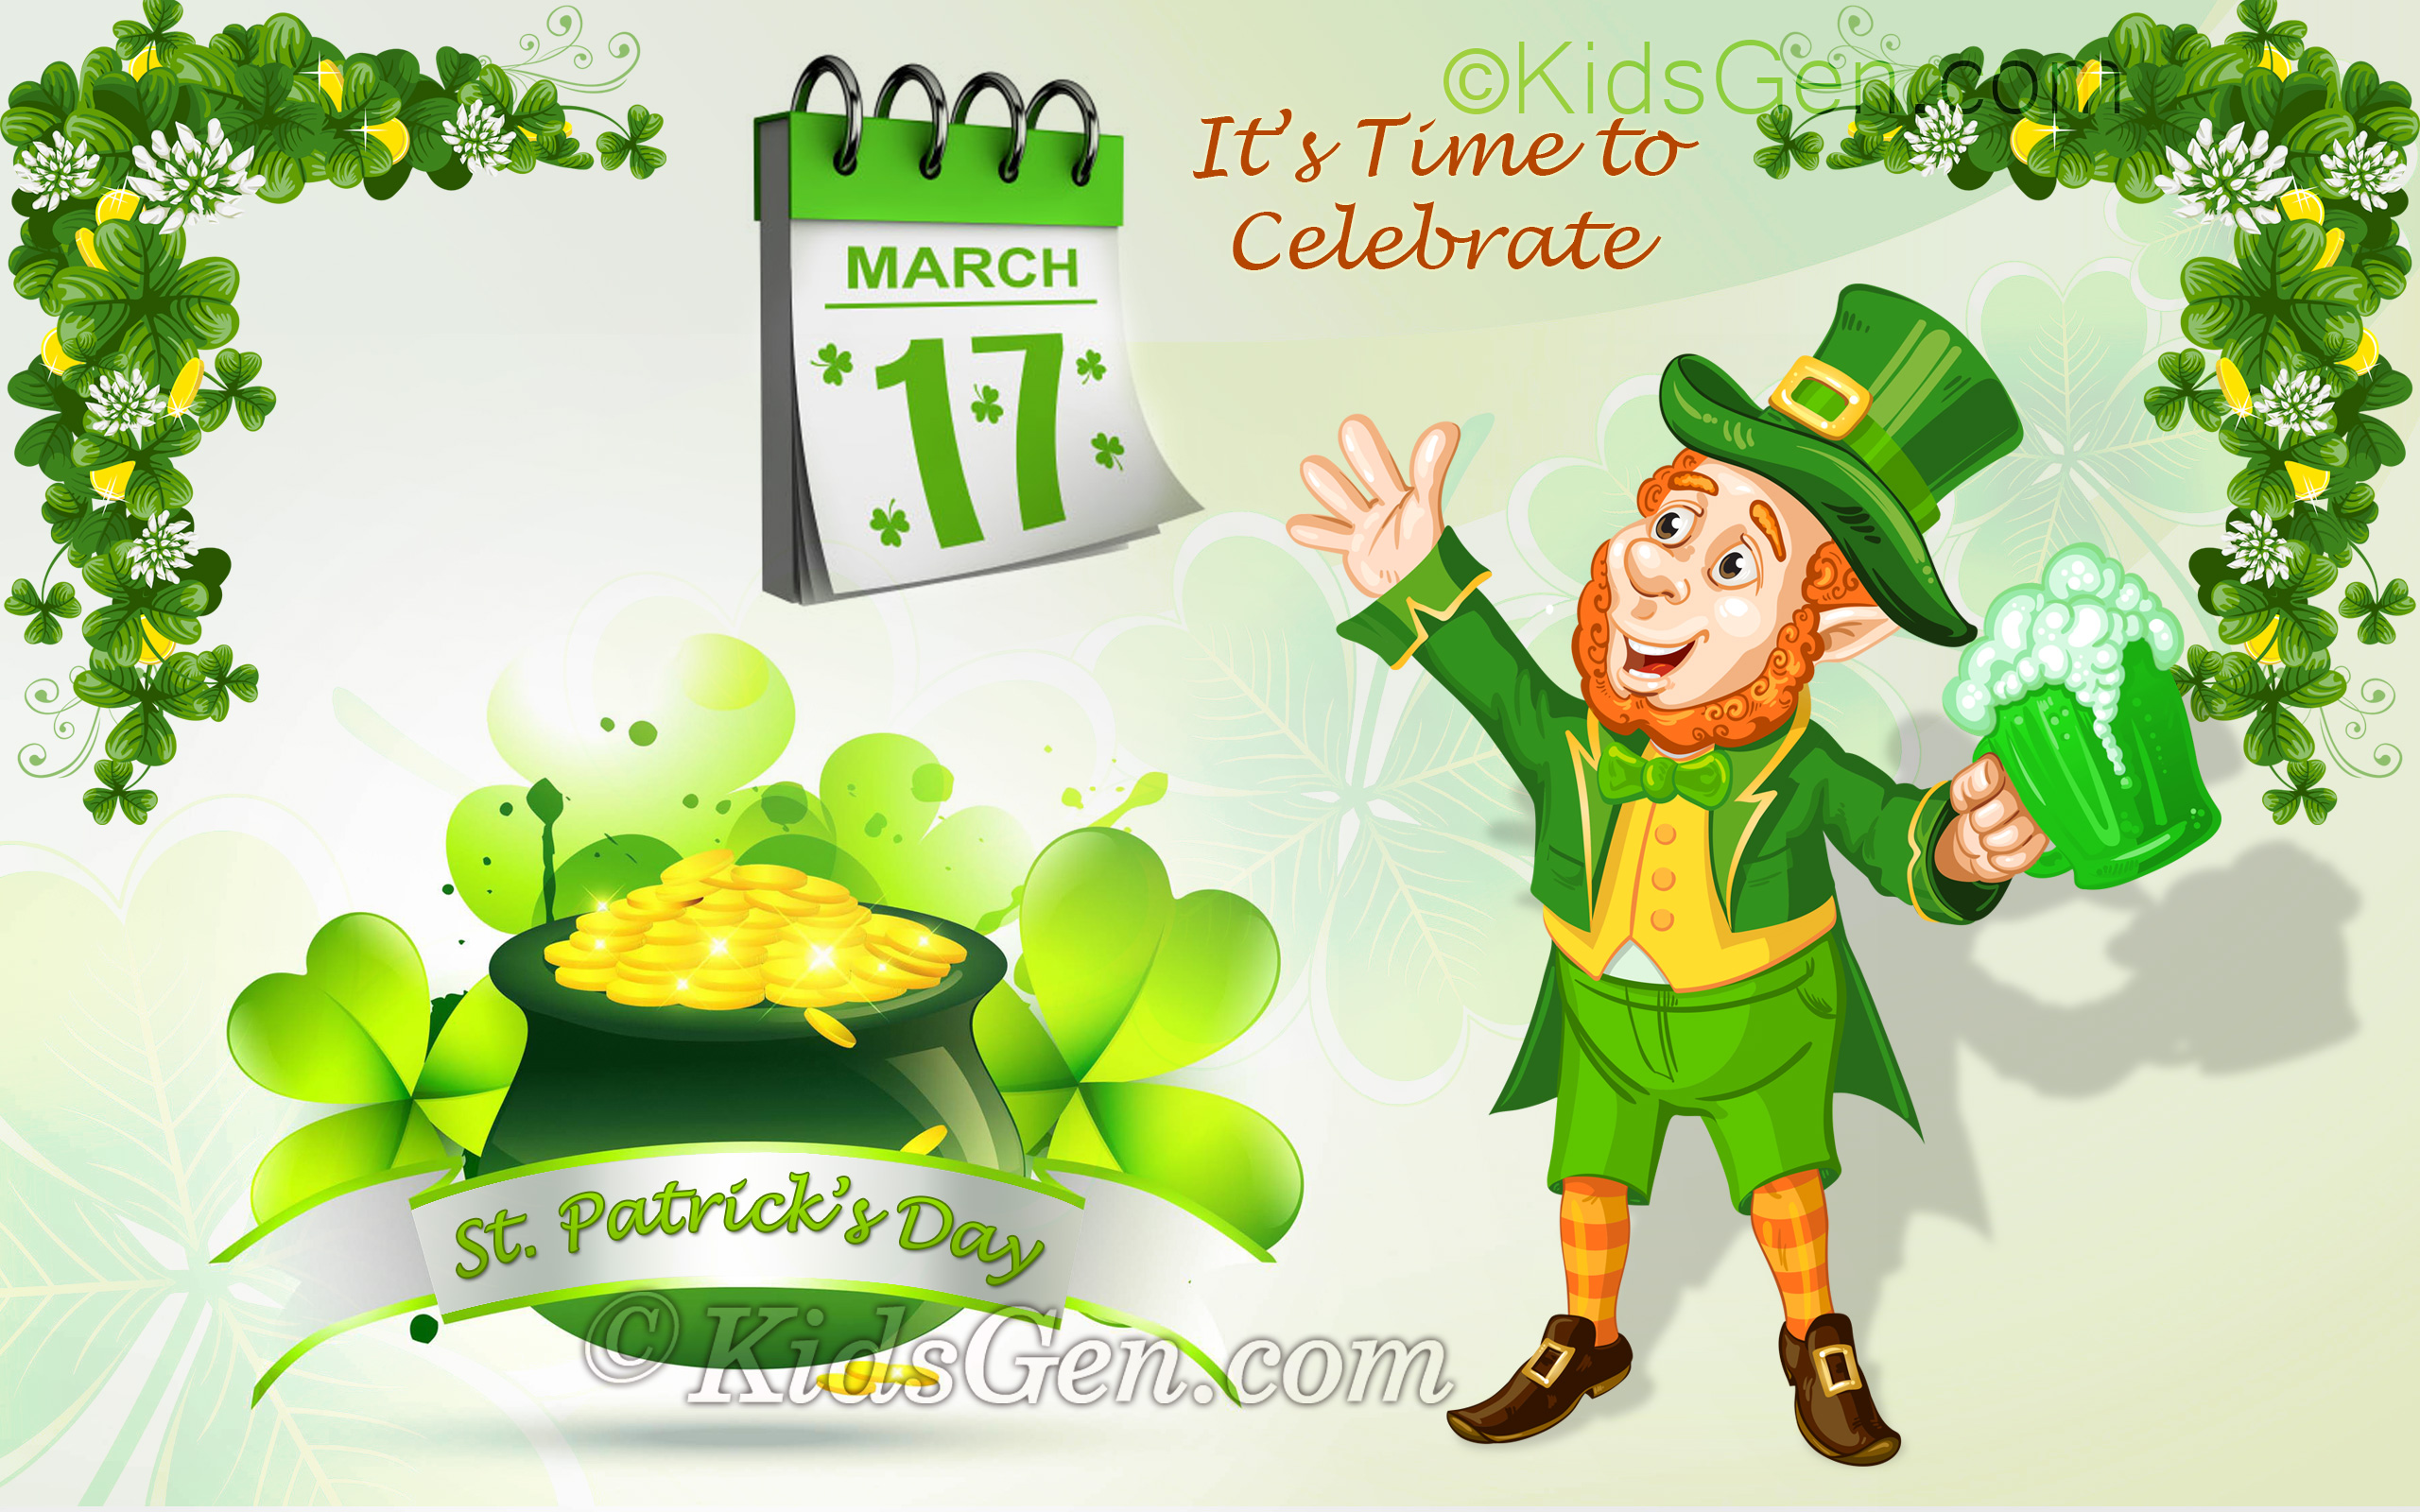 Patricks Day Wallpaper For Kids   Saint Patricks Day Wallpapers 2560x1600